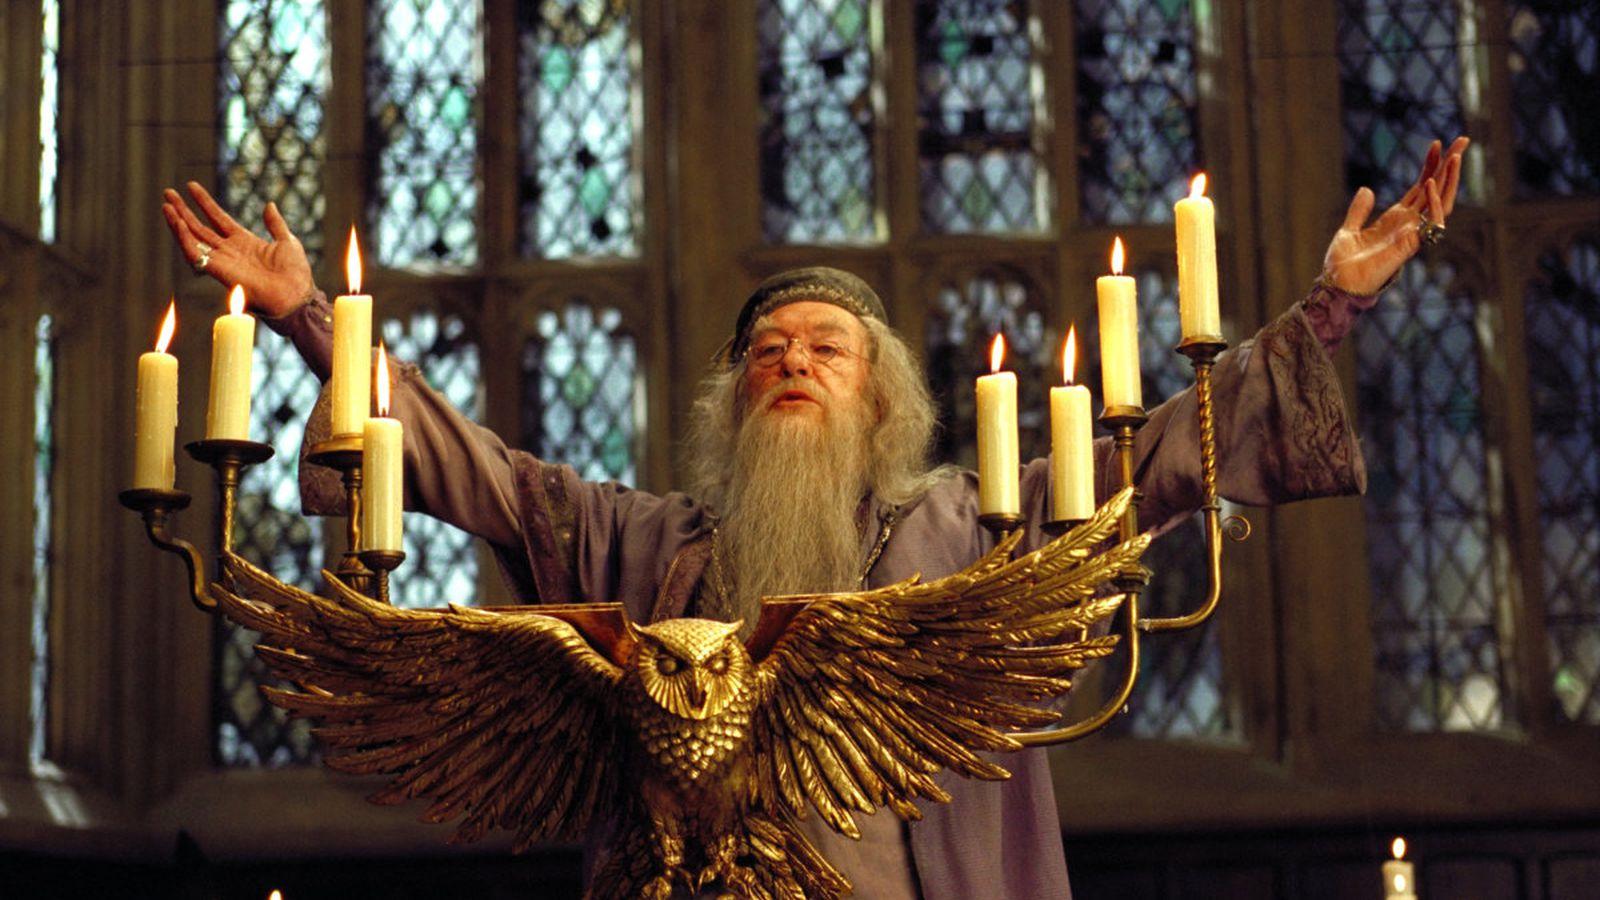 Pokemon Quote Wallpaper Fantastic Beasts 2 Puts Dumbledore Back In The Spotlight